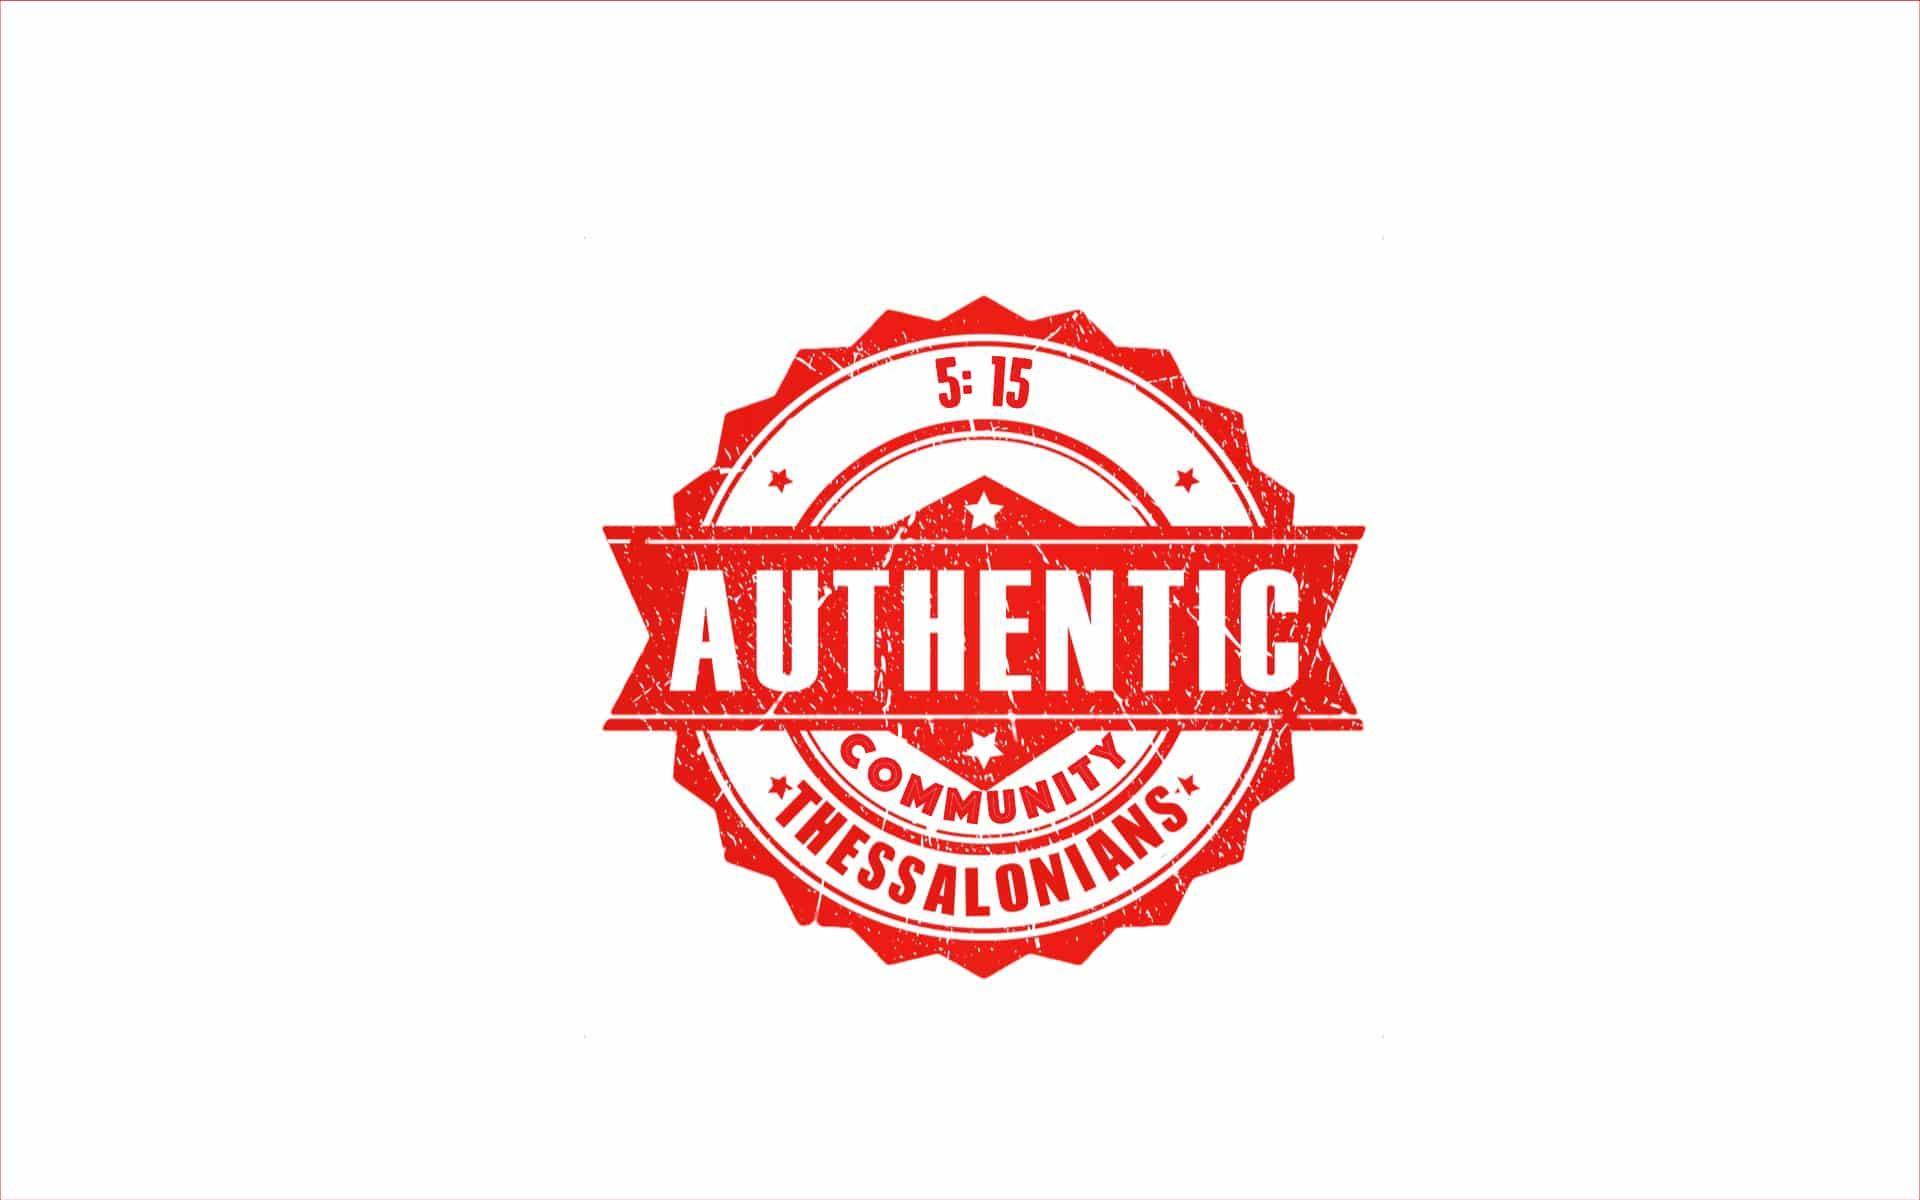 Authentic Community #2